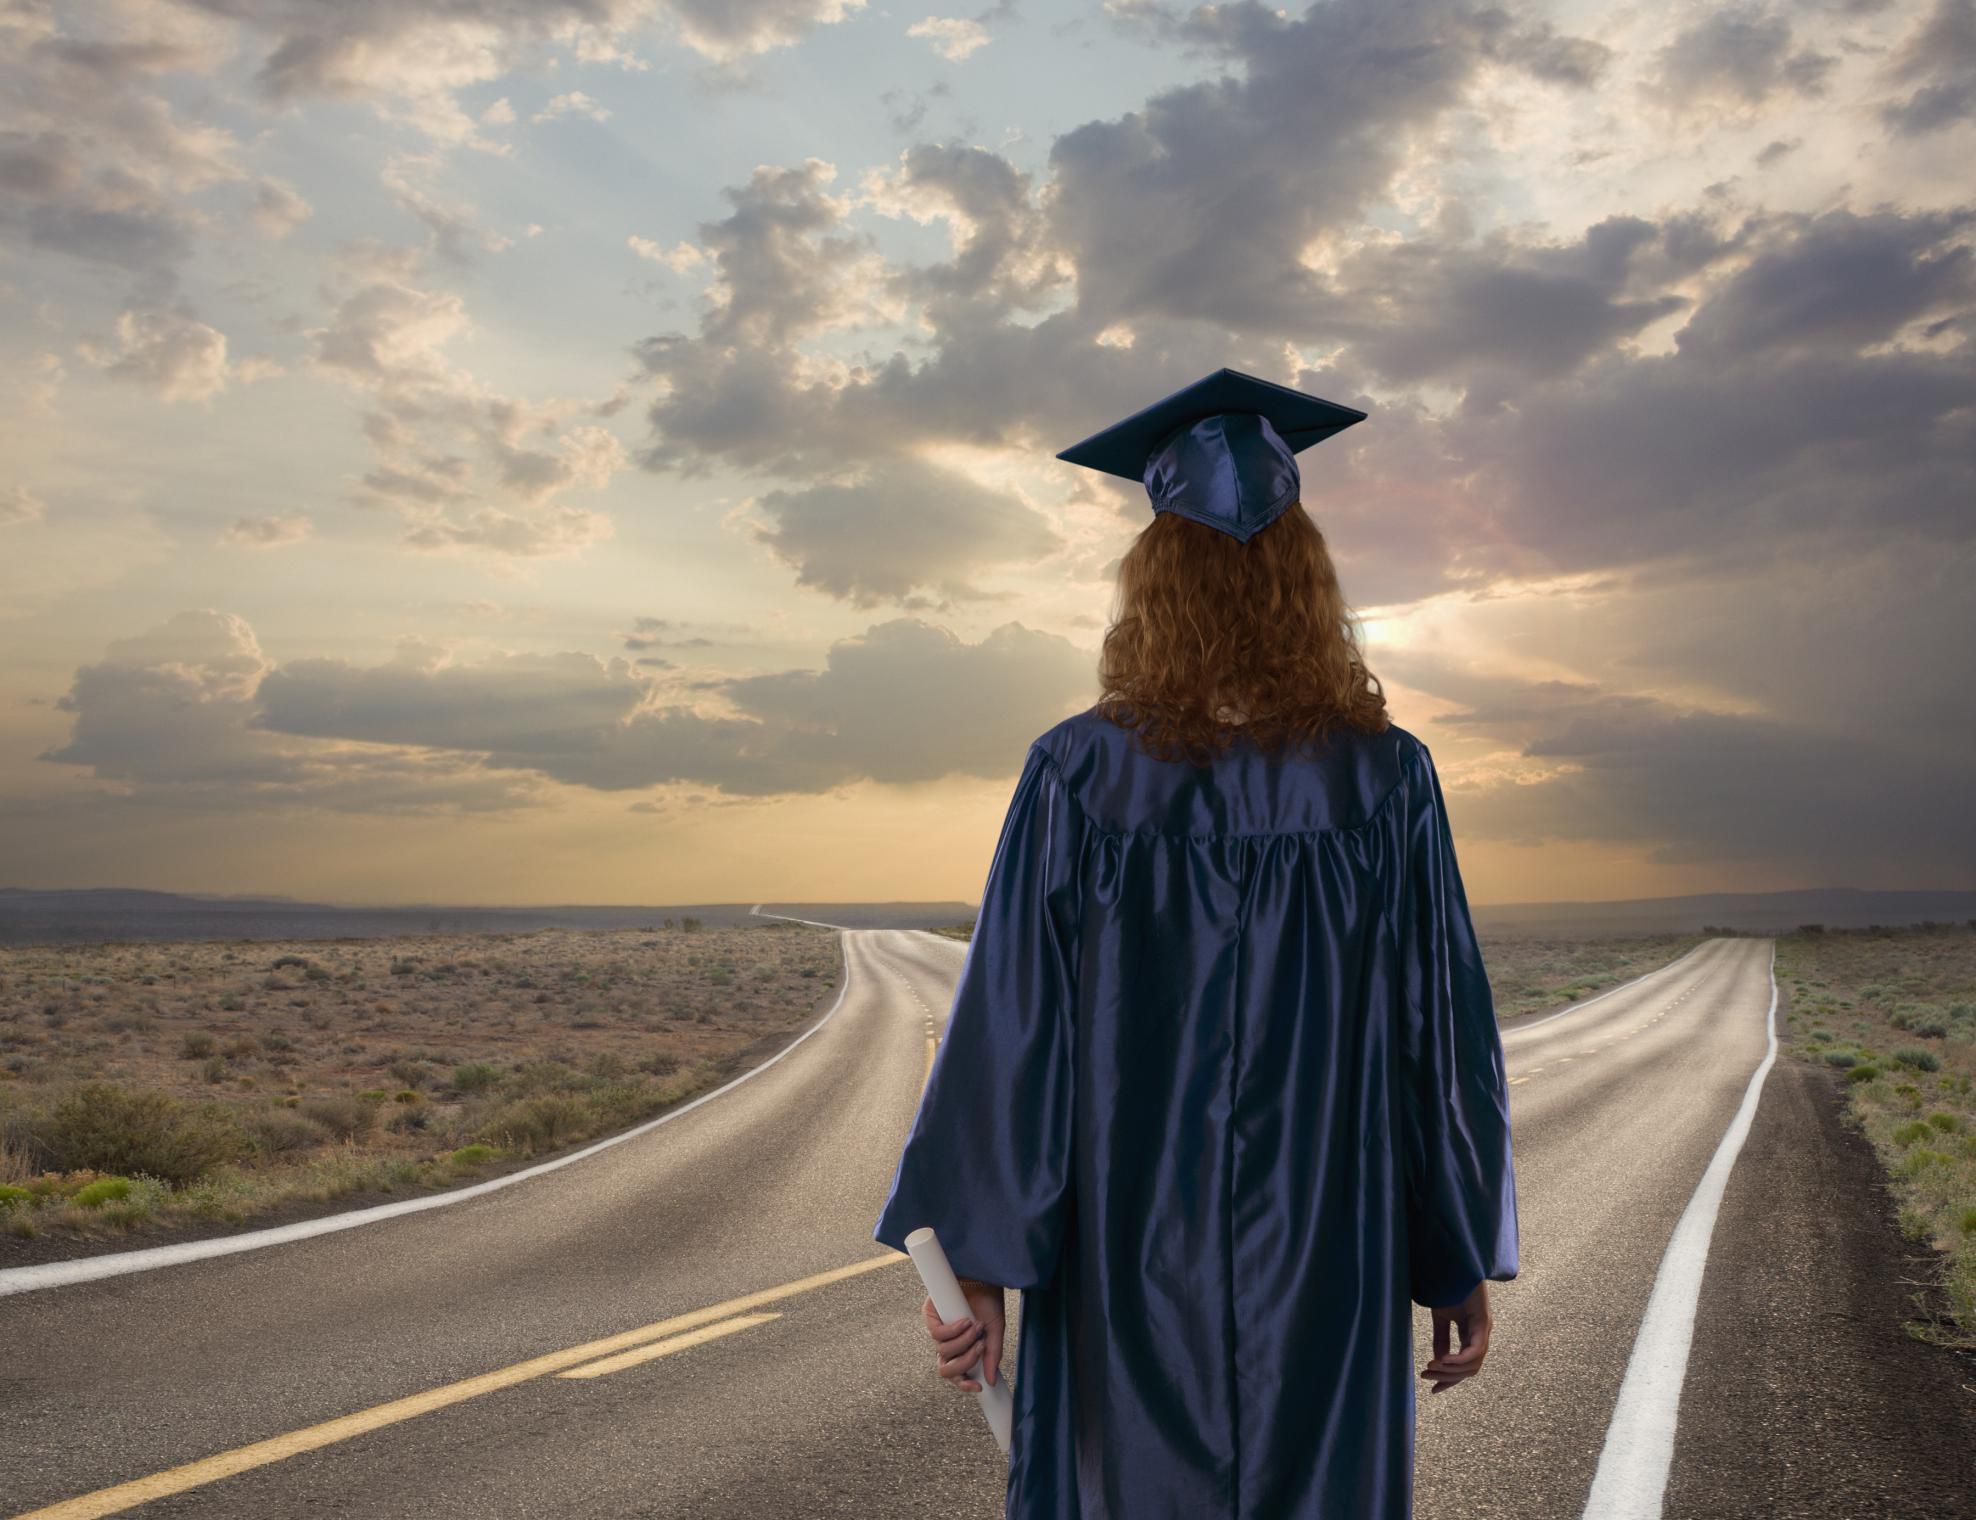 grad school application low gpa justification